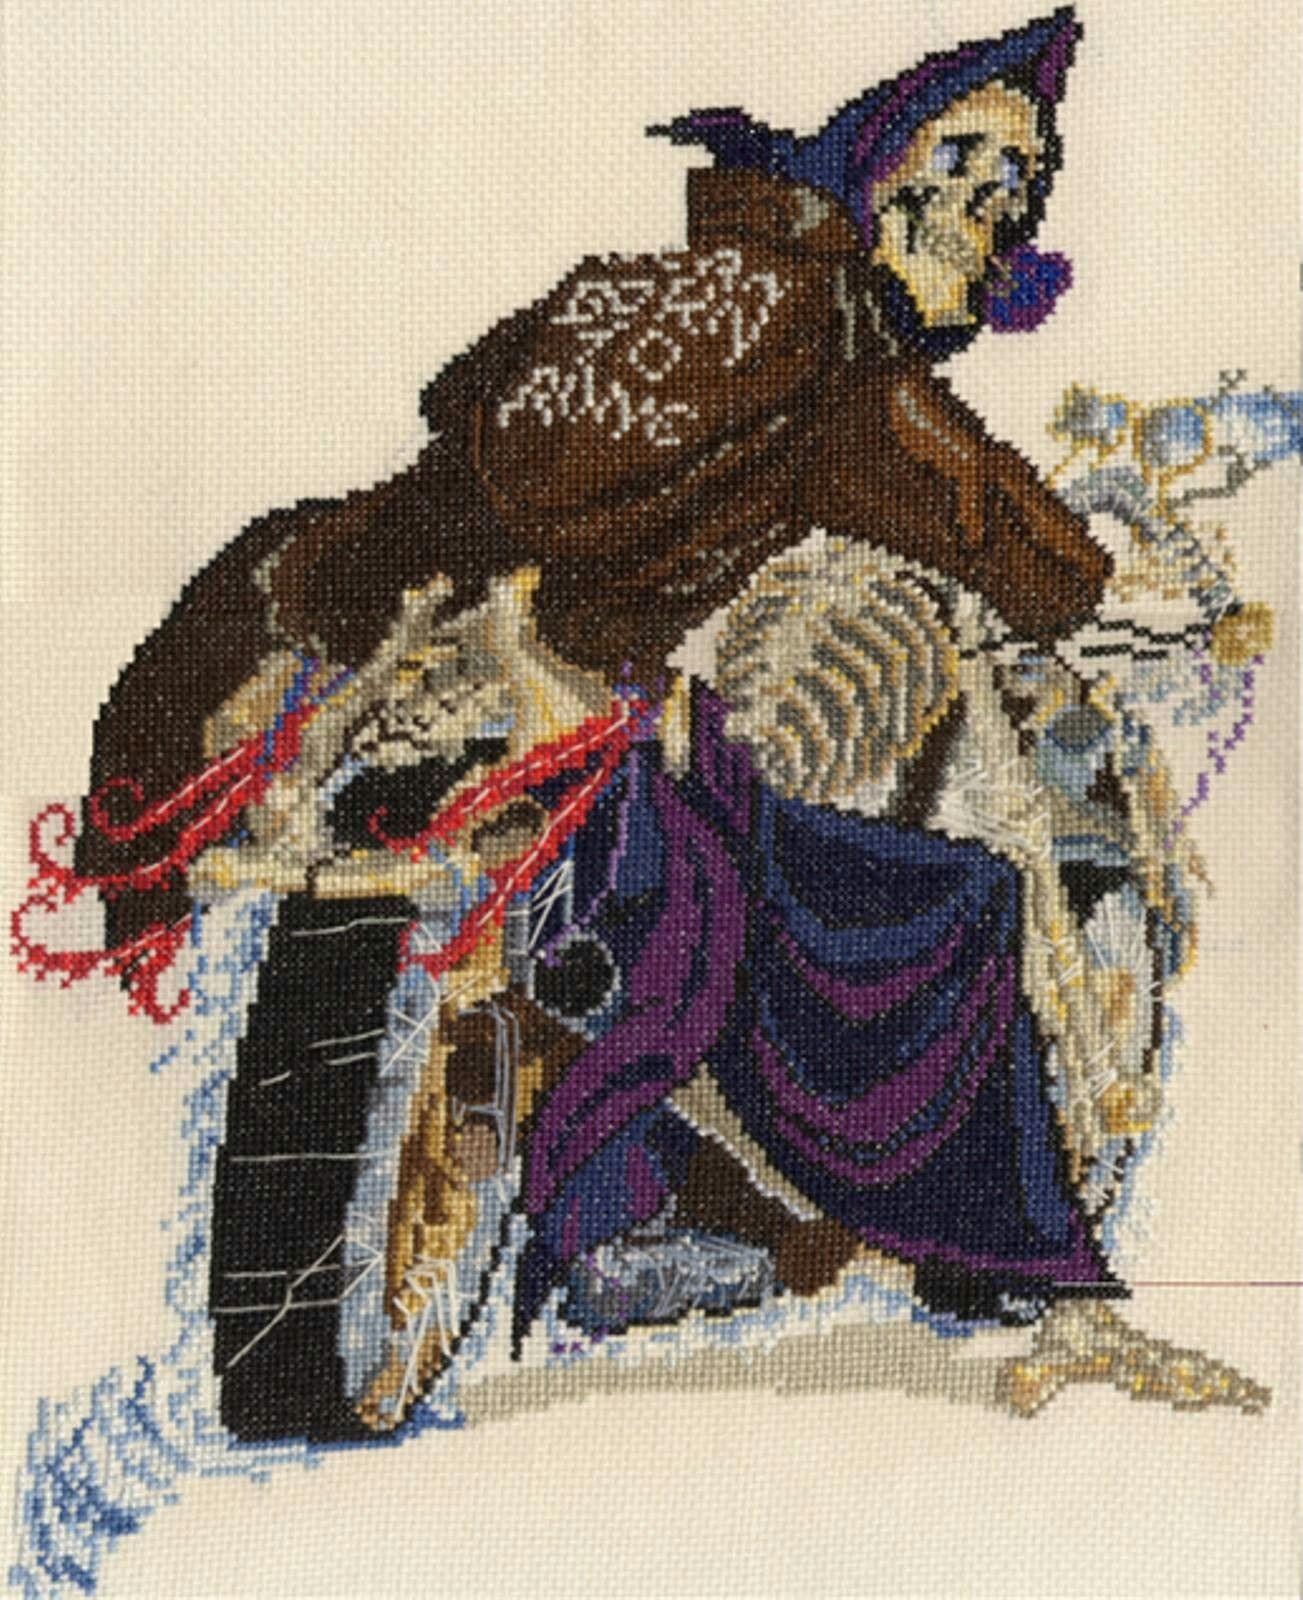 Discworld Rincewind /& the luggage counted cross stitch kit//chart 14s aida